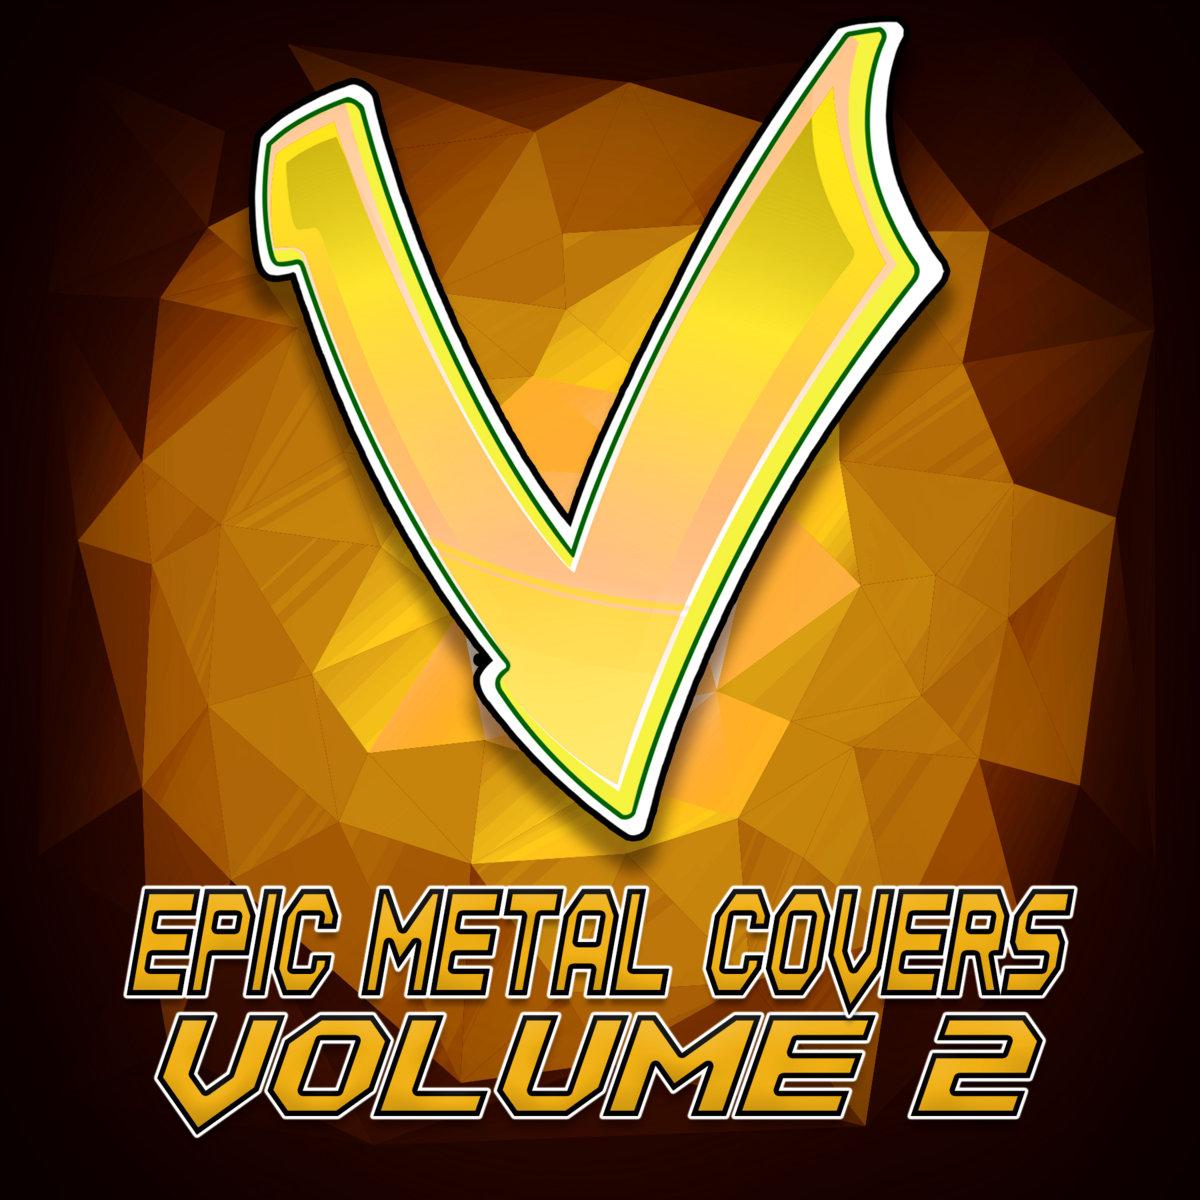 Epic Metal Covers, Vol  1 | Little V